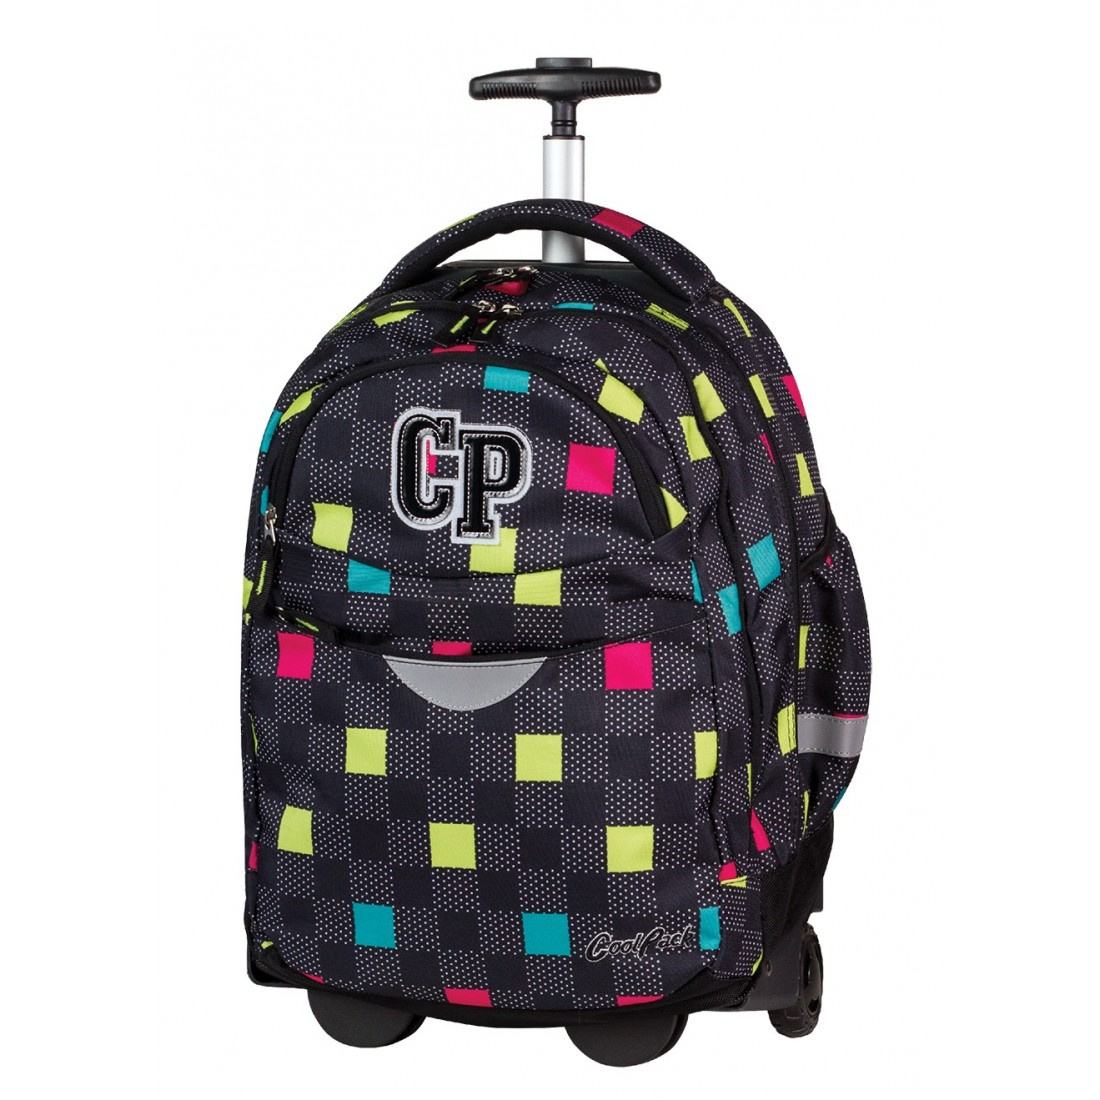 Plecak na kółkach CoolPack CP czarny w kwadraciki RAPID COLOUR TILES 471 - plecak-tornister.pl